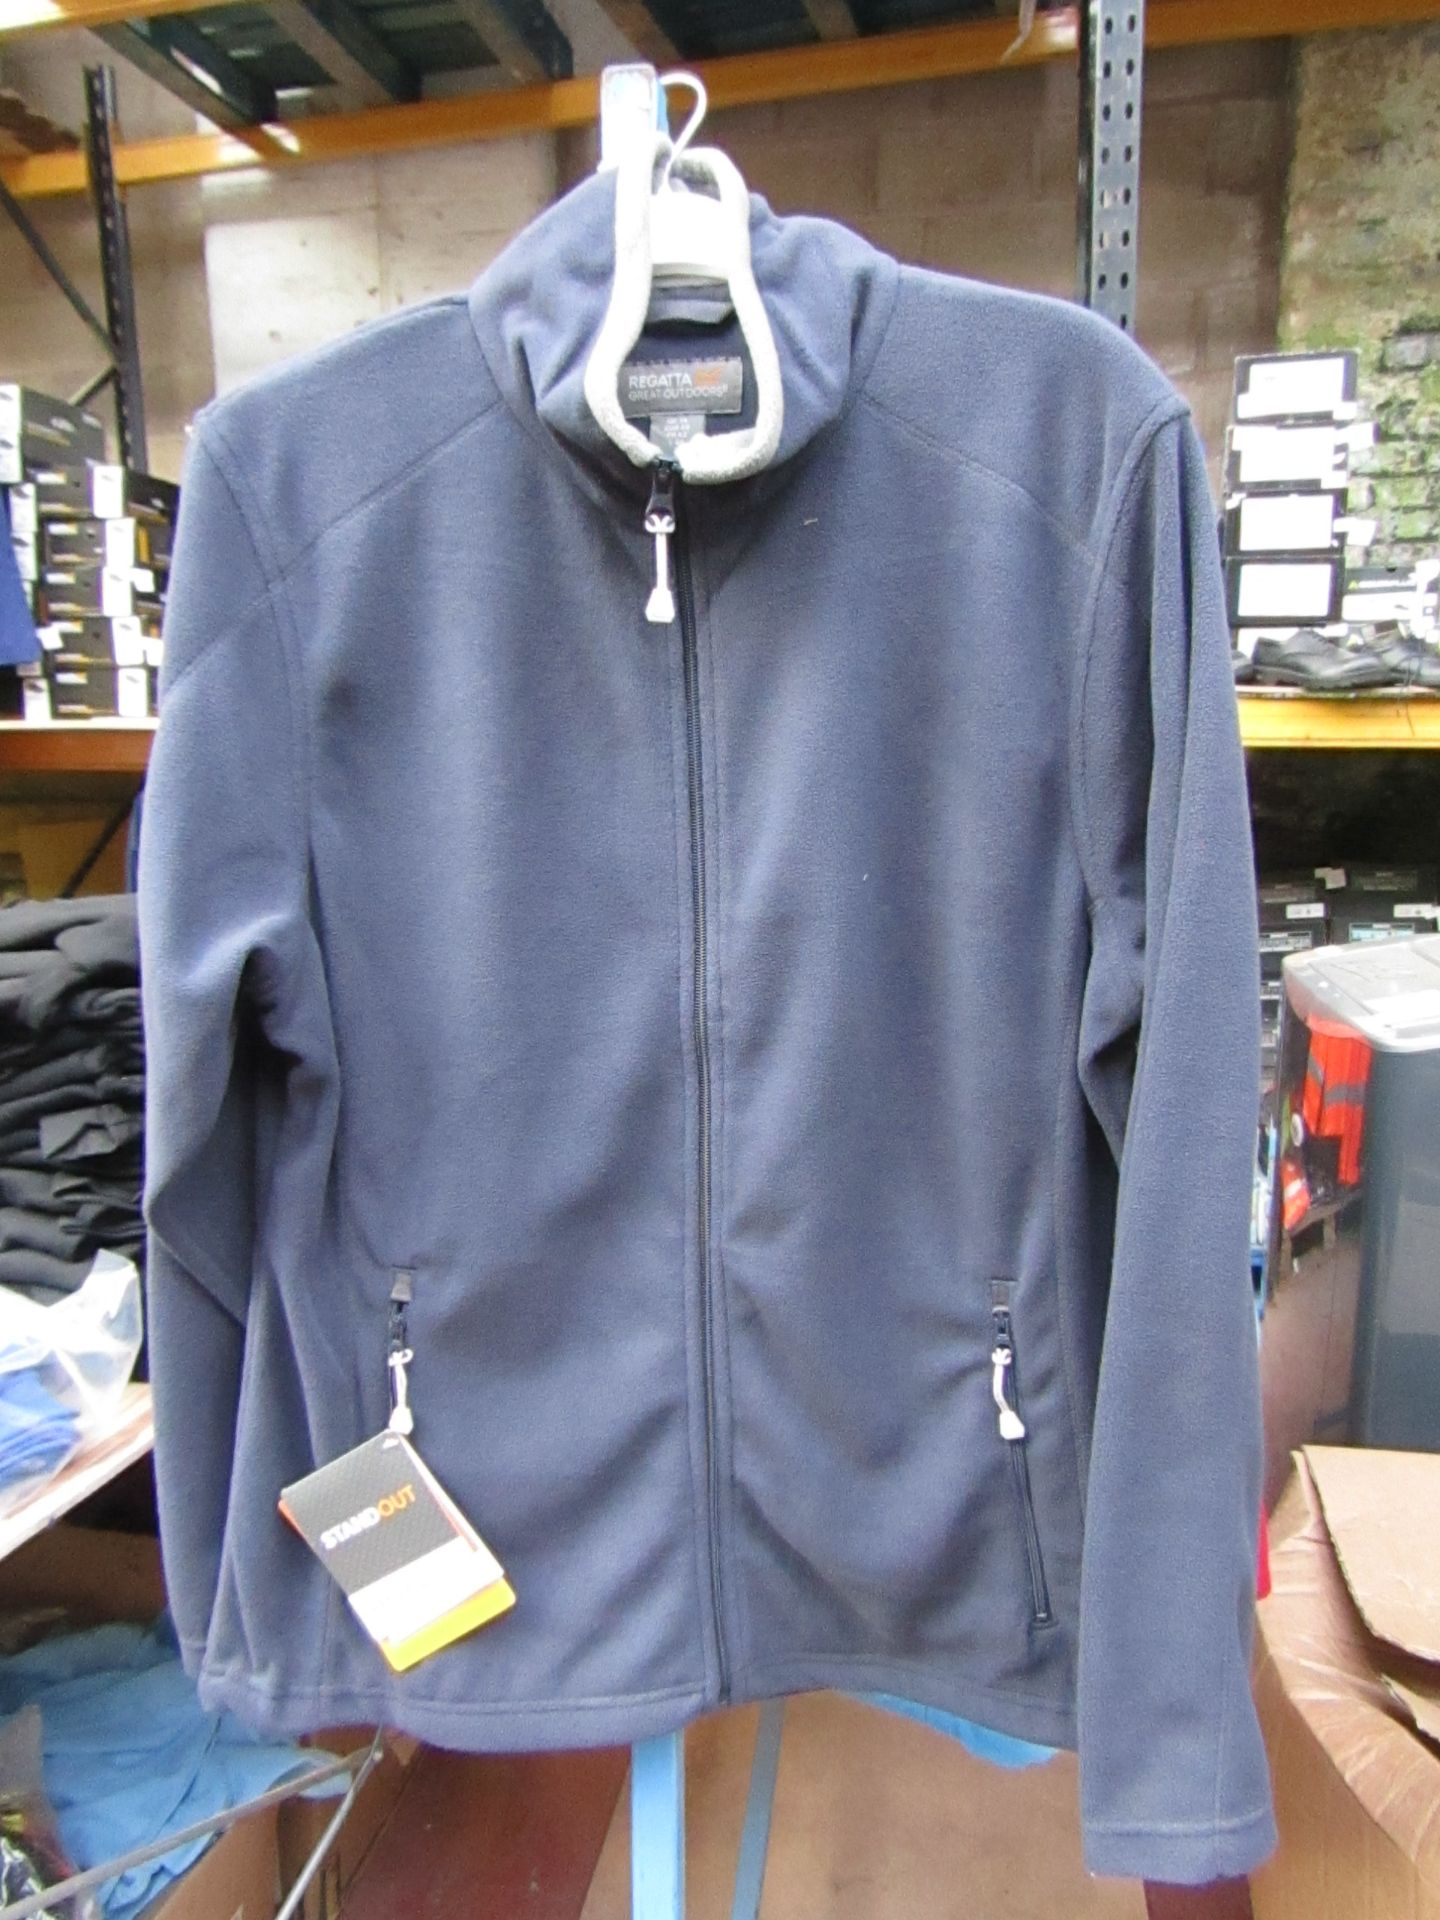 Lot 37 - Ladies Regatta Professional Fleece Navy / Smoke. Size 12. new in Packaging